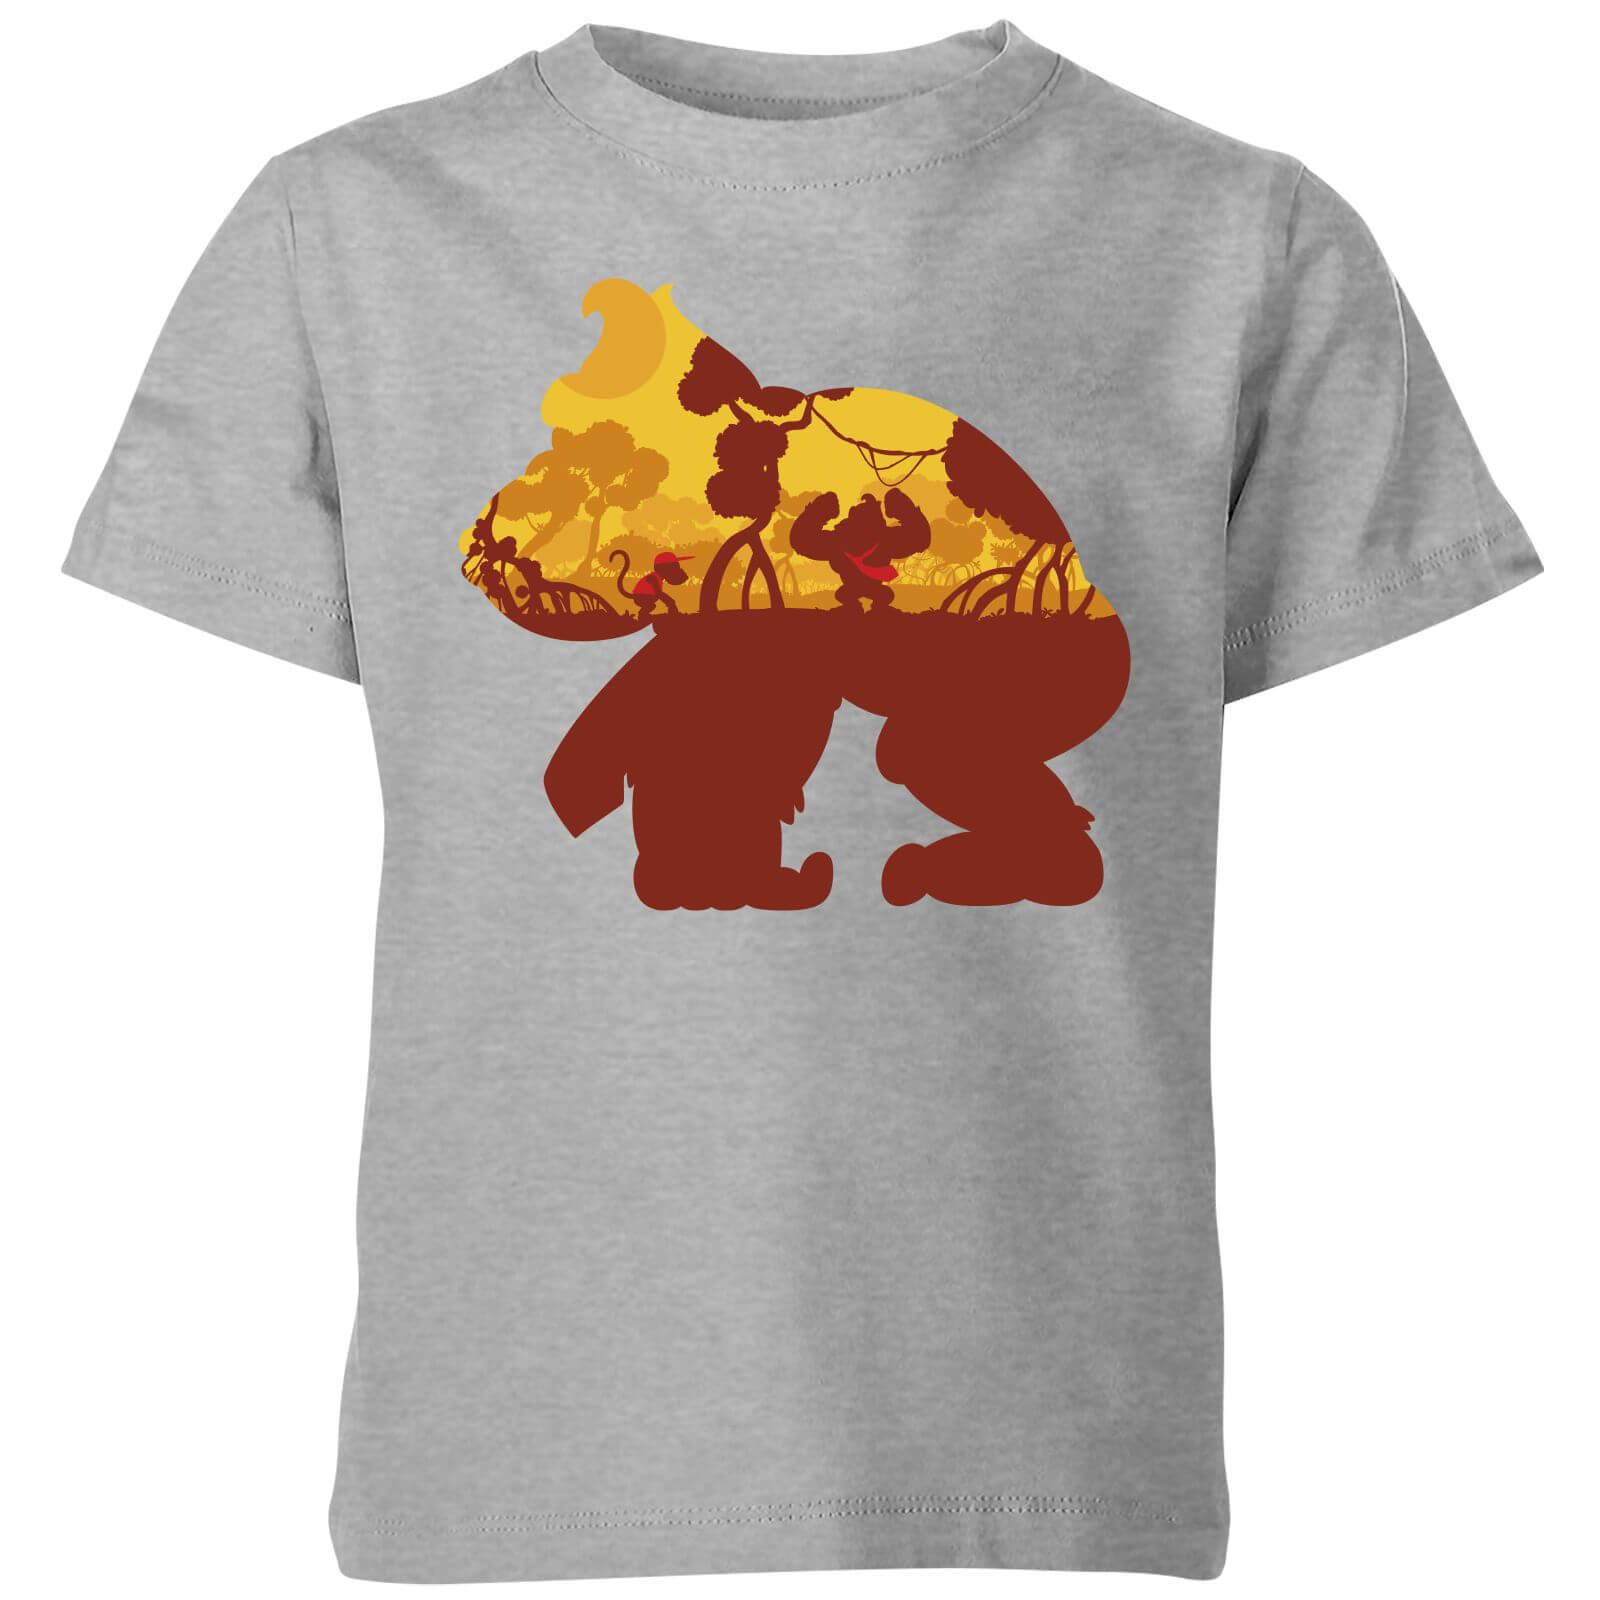 375ee0170615ca Nintendo Donkey Kong Silhouette Mangrove Kid s T-Shirt - Grey